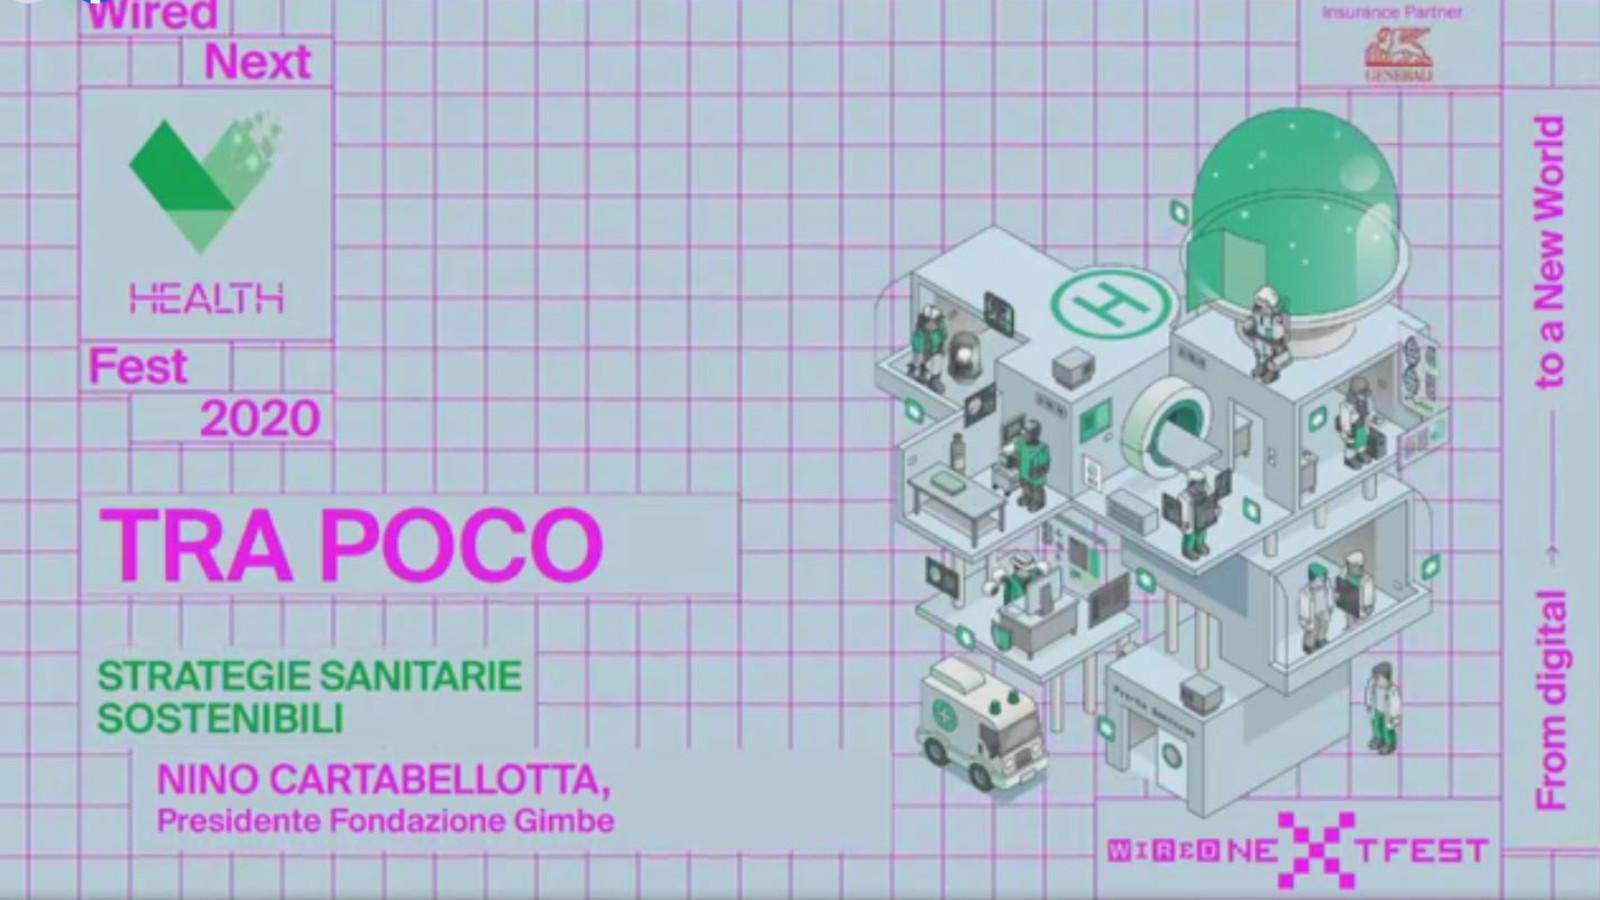 HEALTH 02 - Valentina Corio - Italy - Wired Health